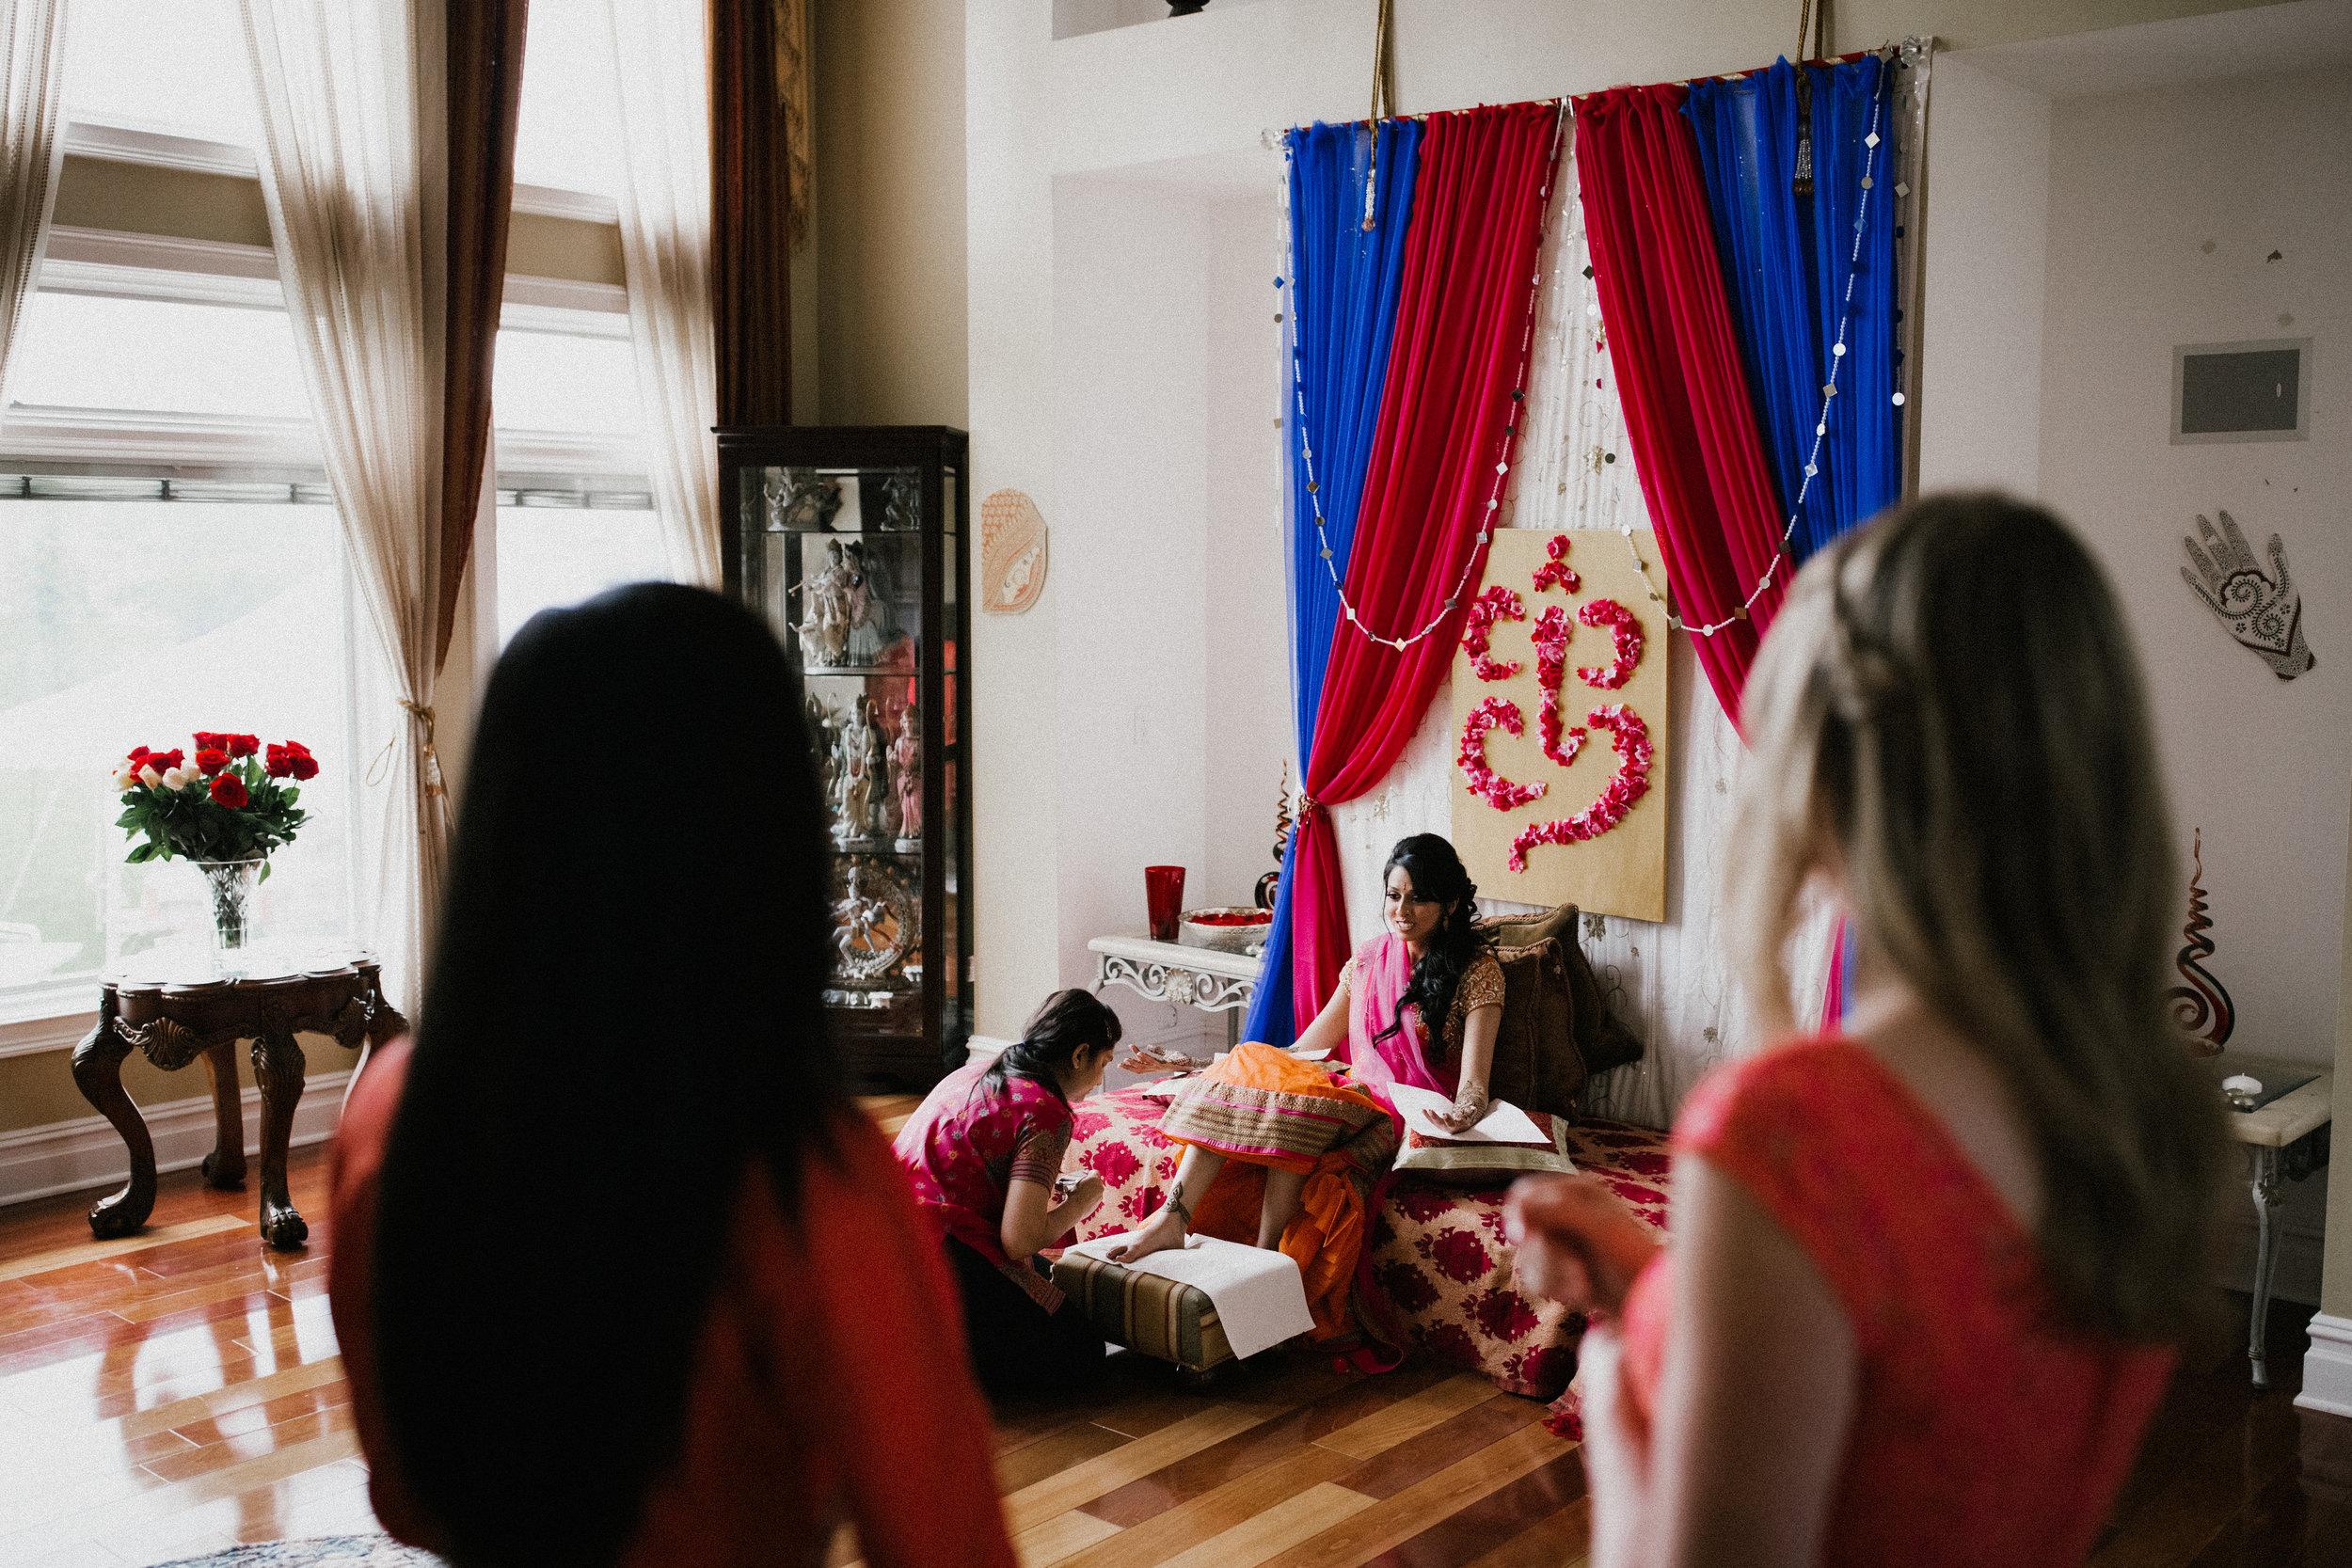 Aparna-Ankit-Patel-Mehndi-Wedding-Photos-0007.jpg